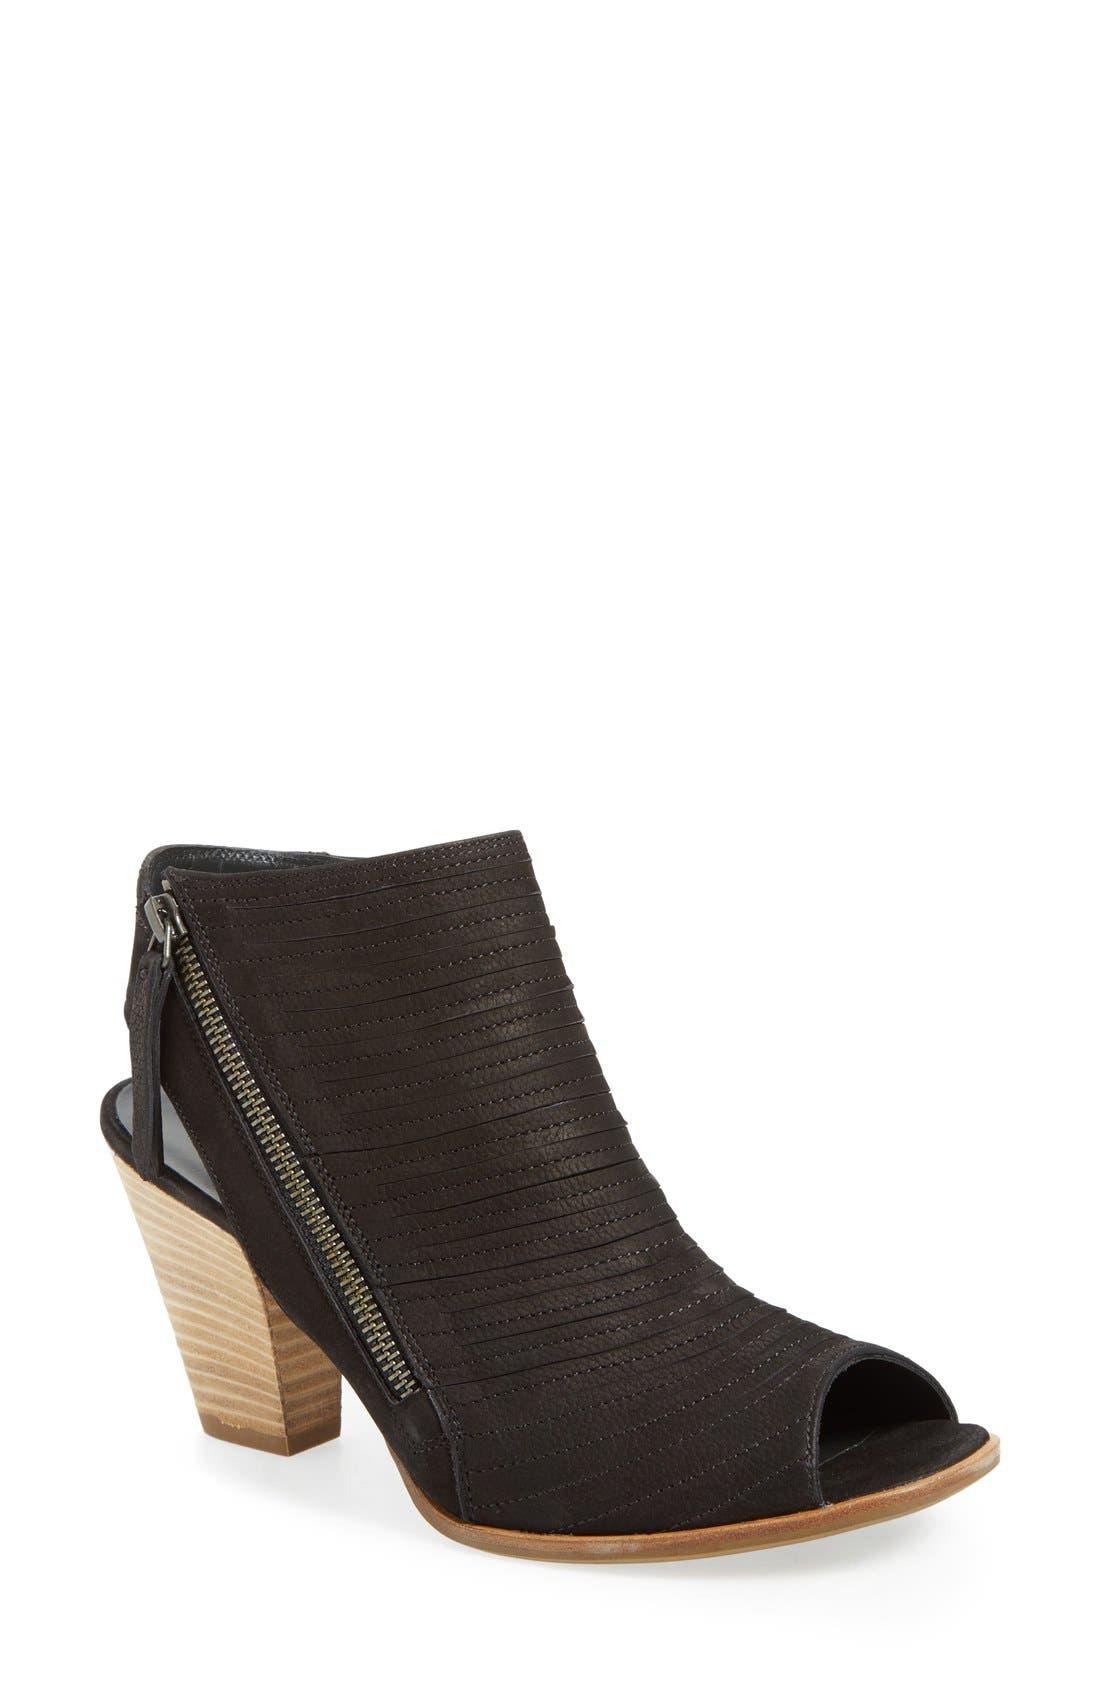 Alternate Image 1 Selected - Paul Green 'Cayanne' Leather Peep Toe Sandal (Women)